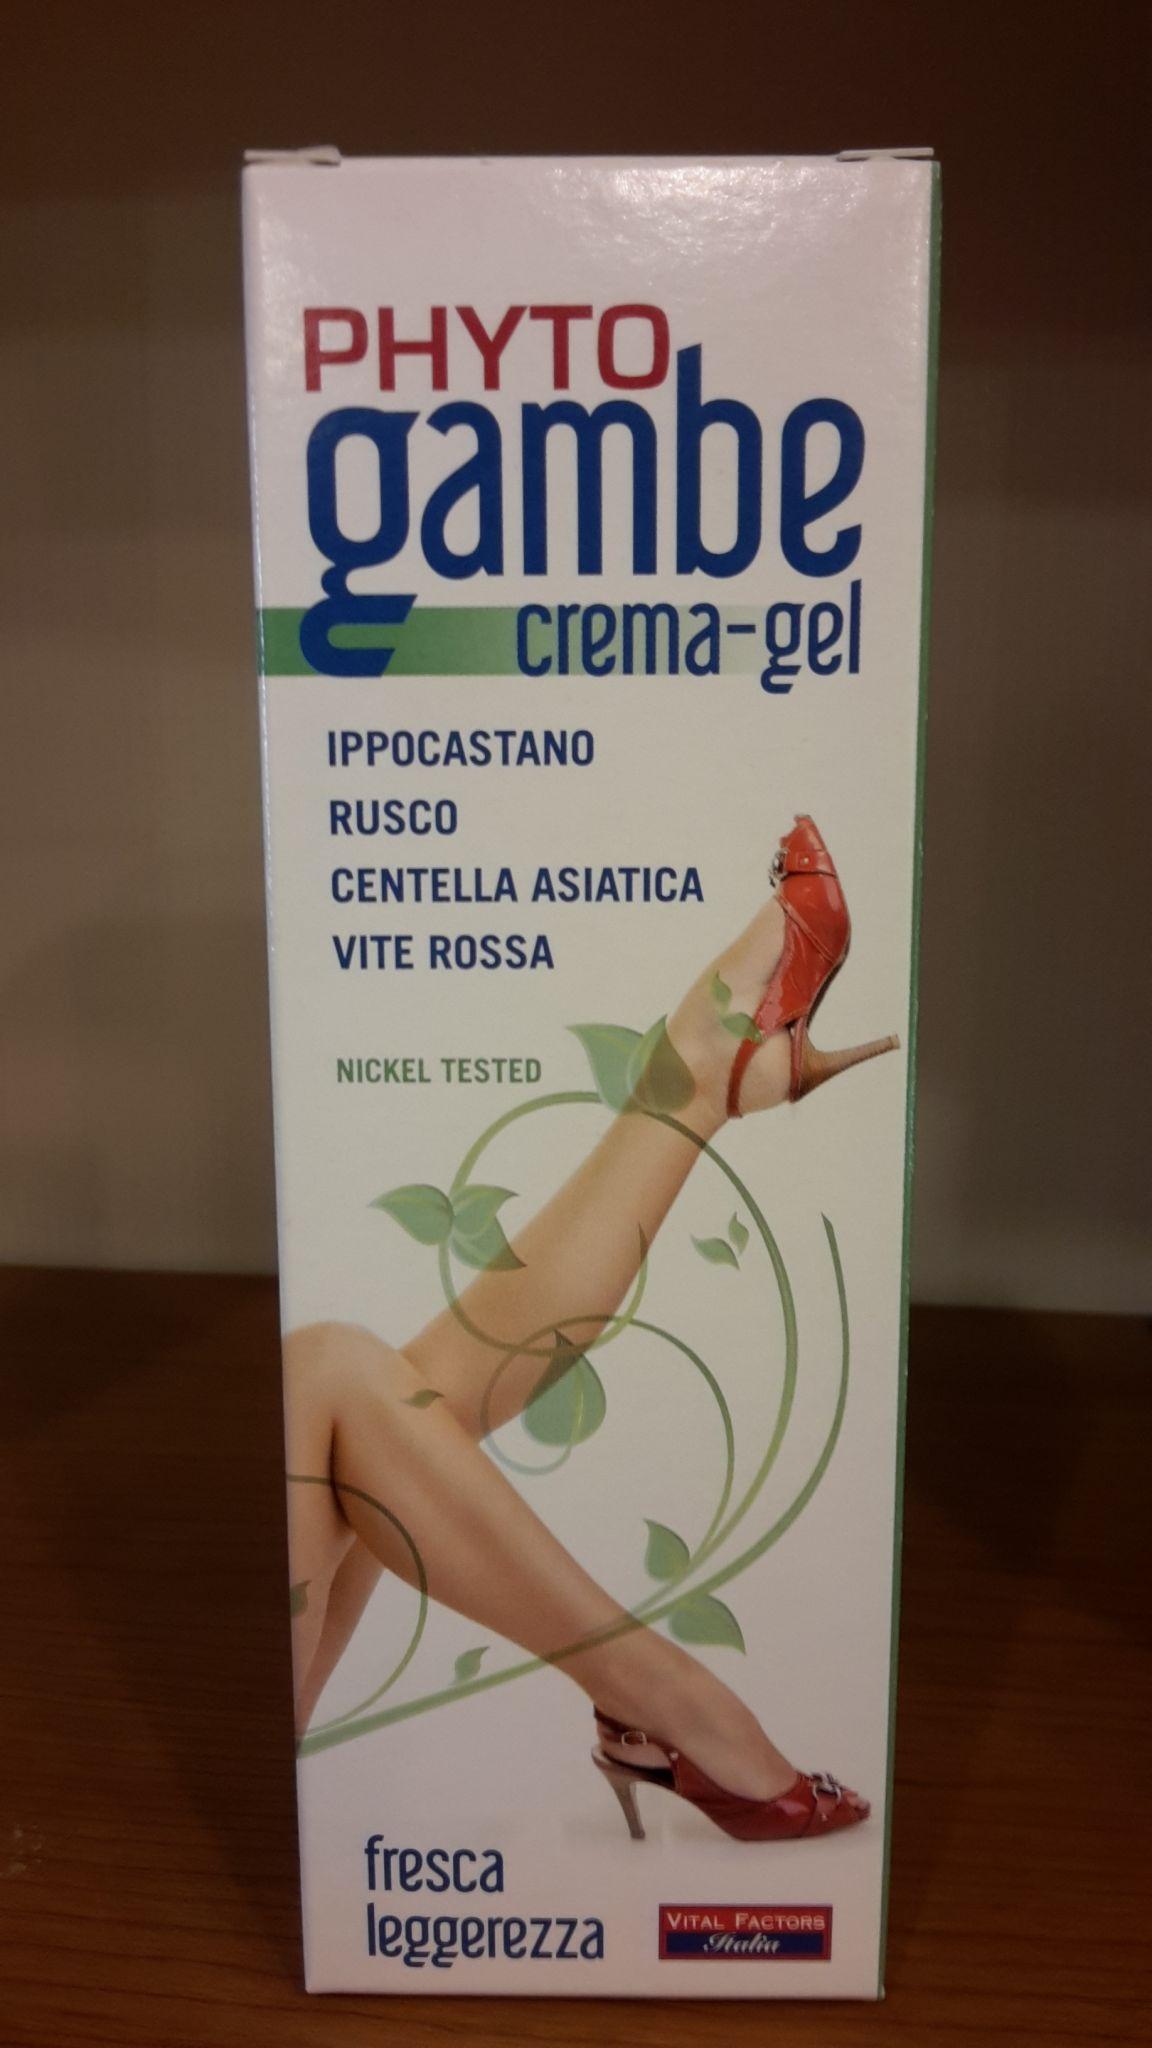 PHYTO GAMBE crema - gel 100 ml-  VITAL FACTORS